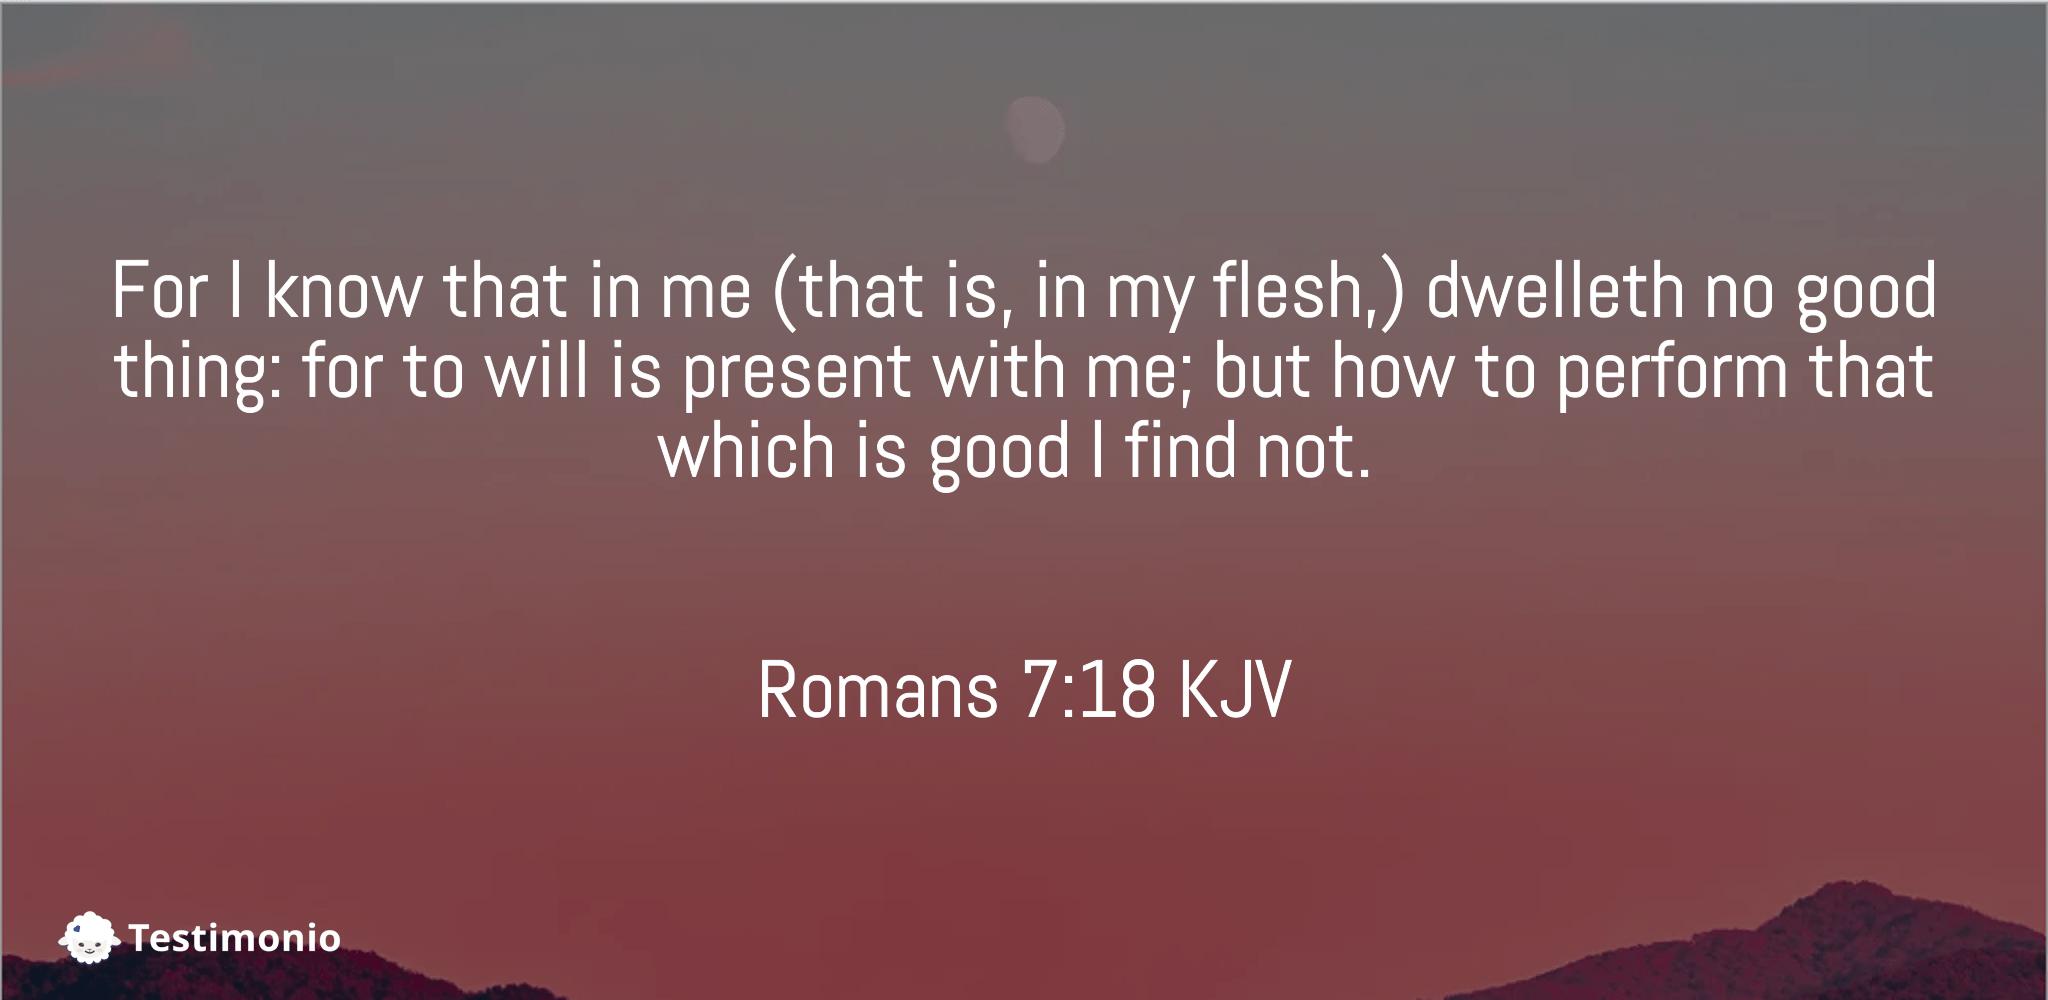 Romans 7:18